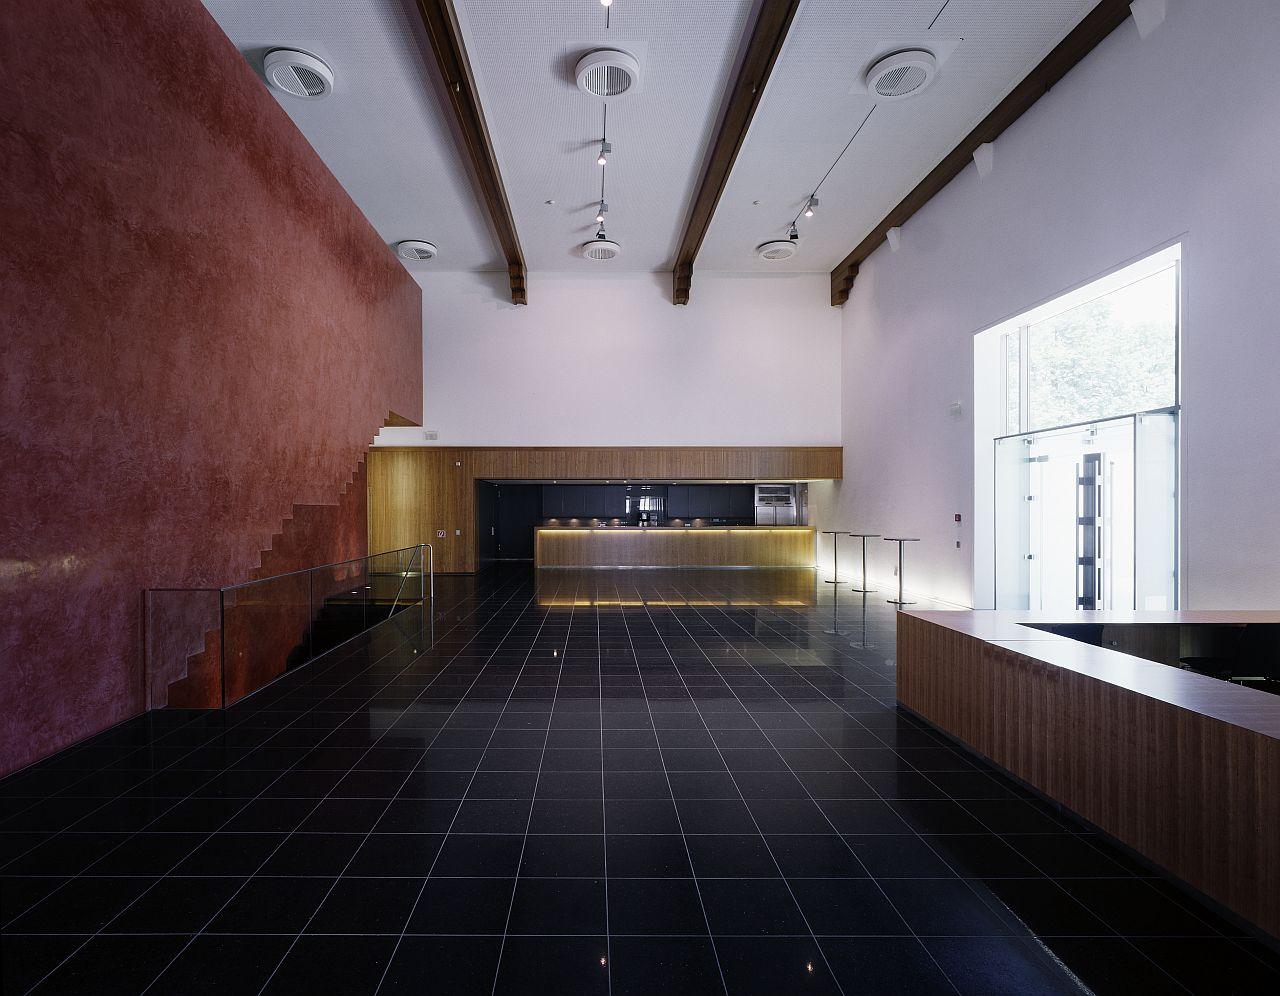 Festhalle Oberes Foyer